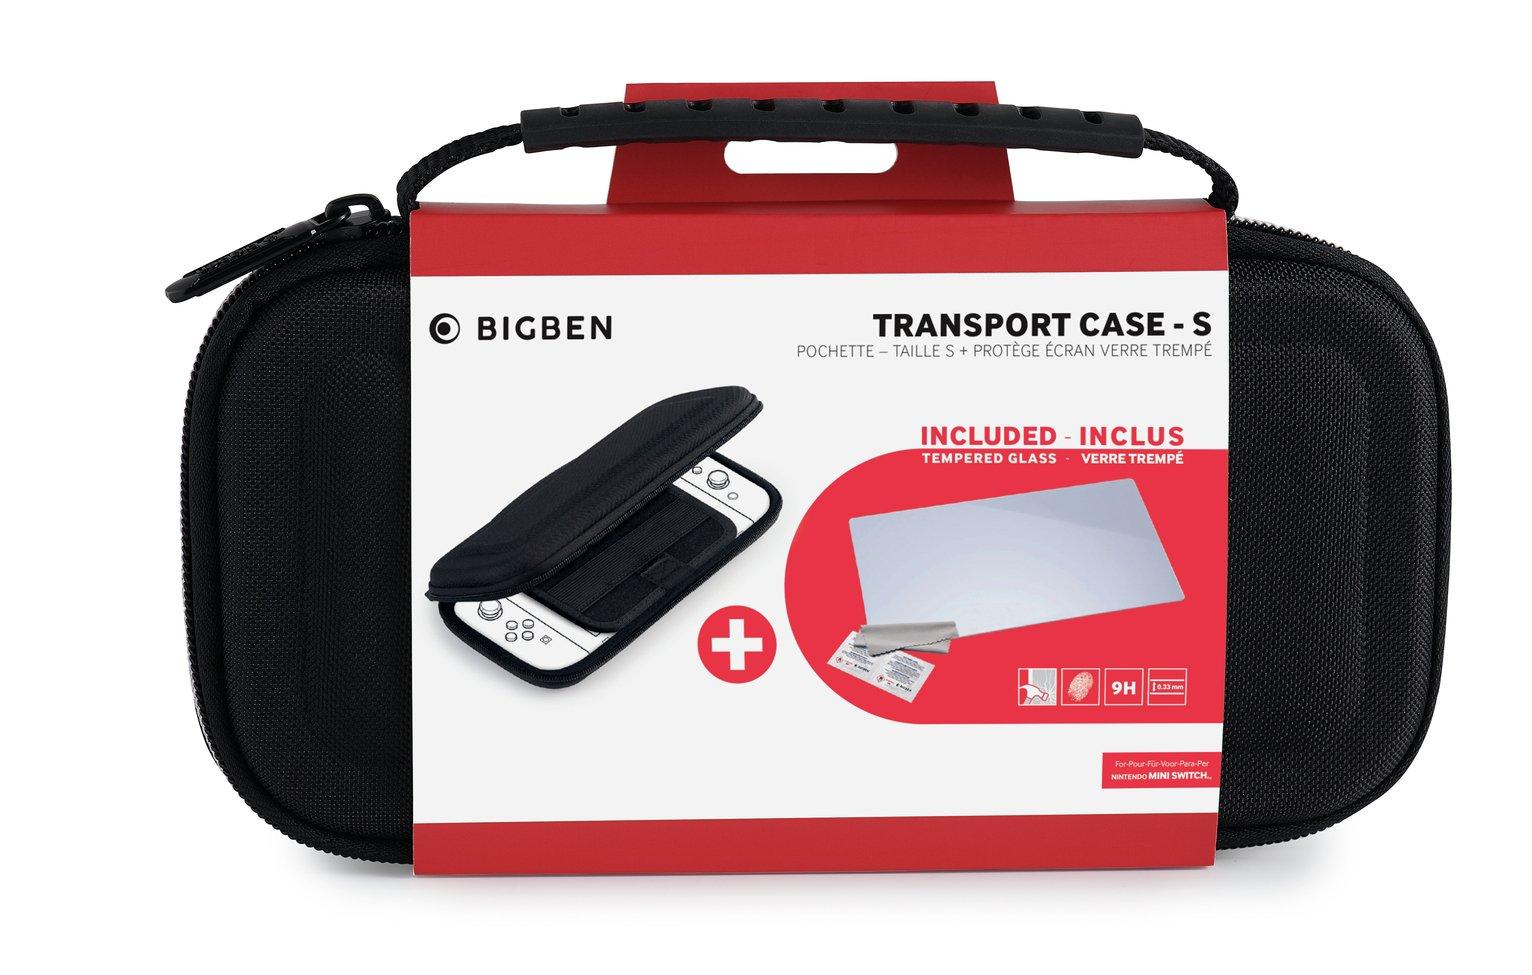 Nintendo Switch Lite Travel Case & Screen Protector Bundle